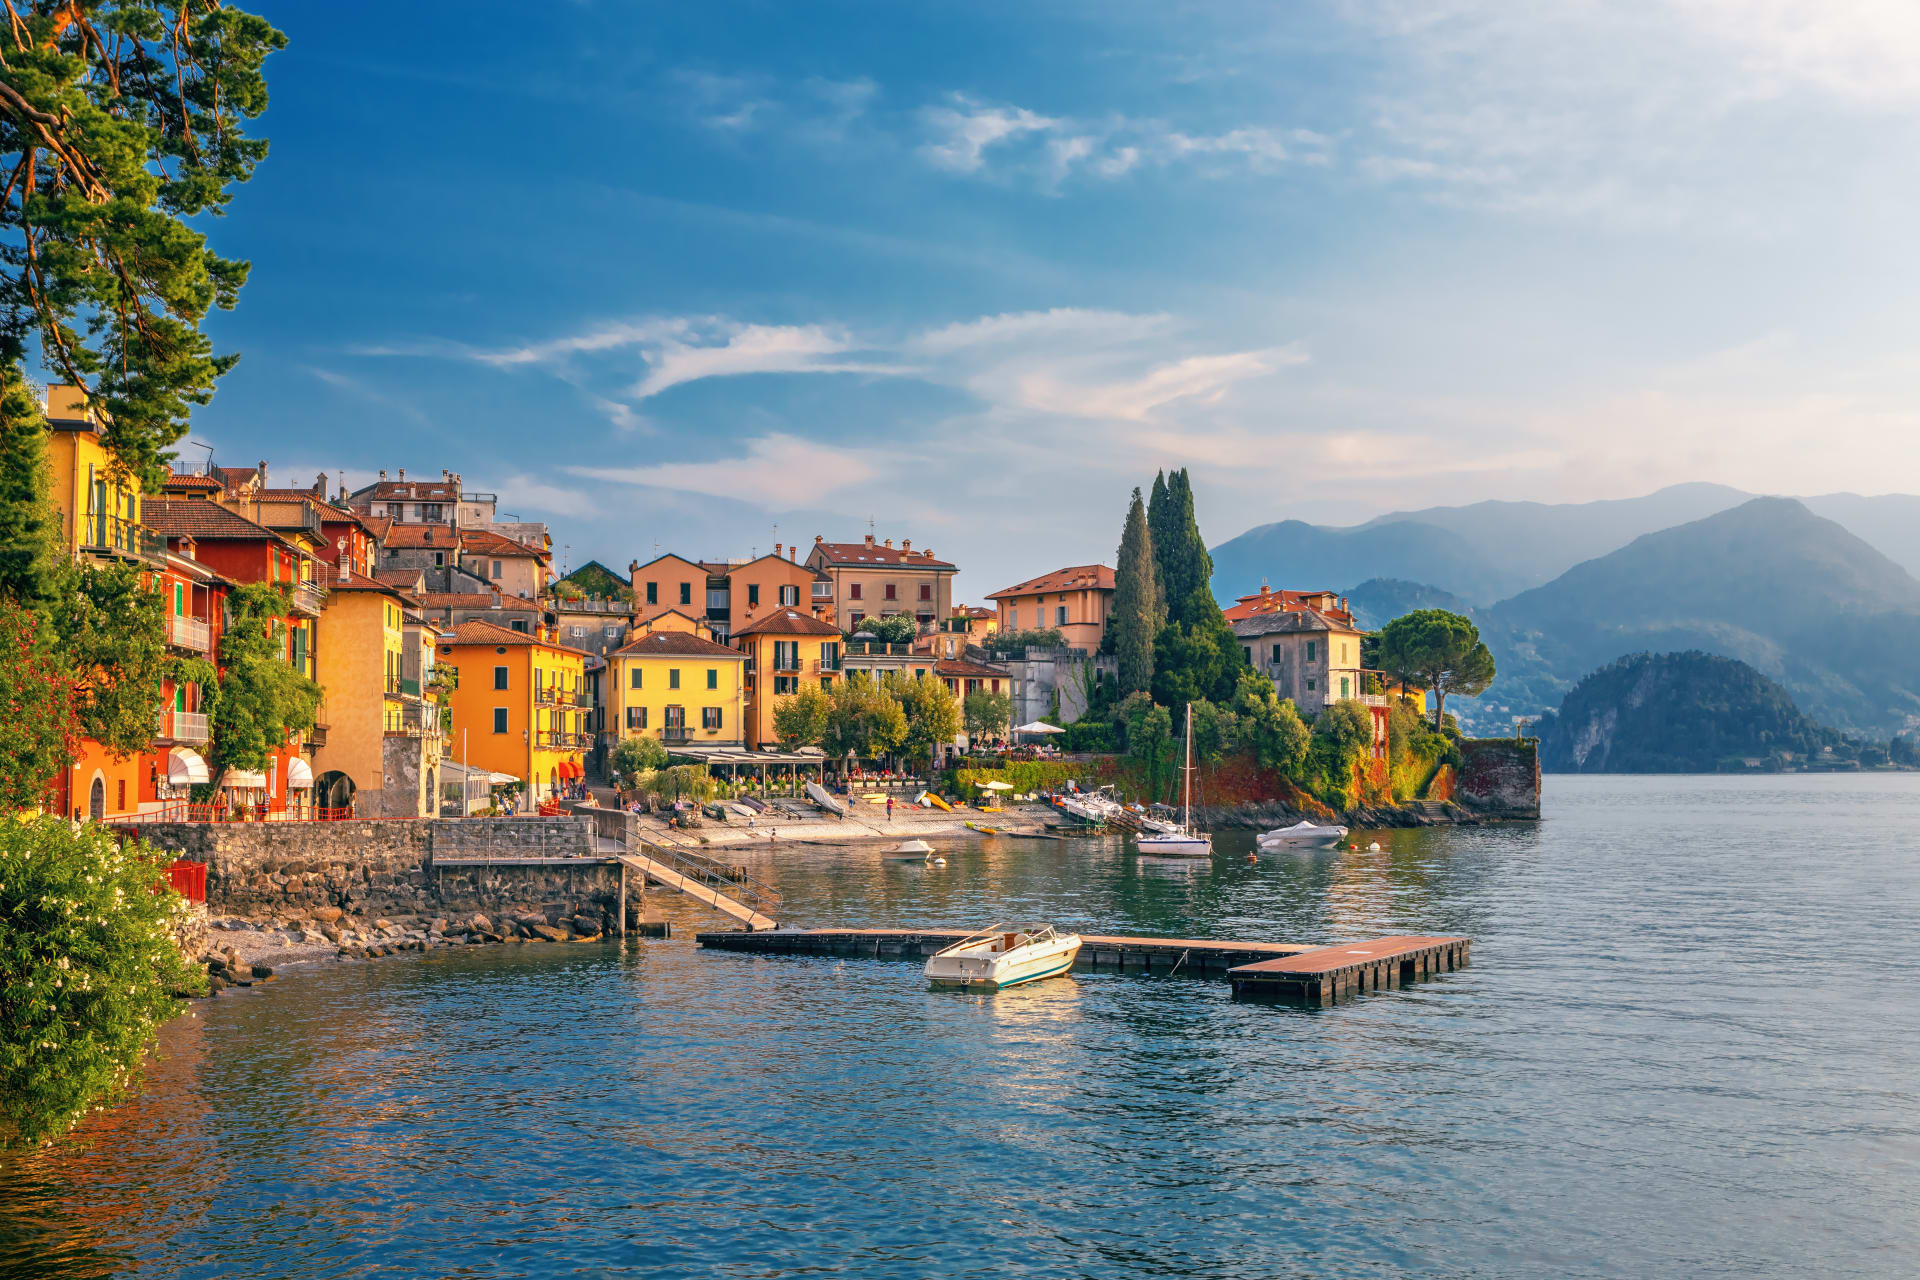 Lake Como - Lake Como – Part 3, Panoramic Boat Trip